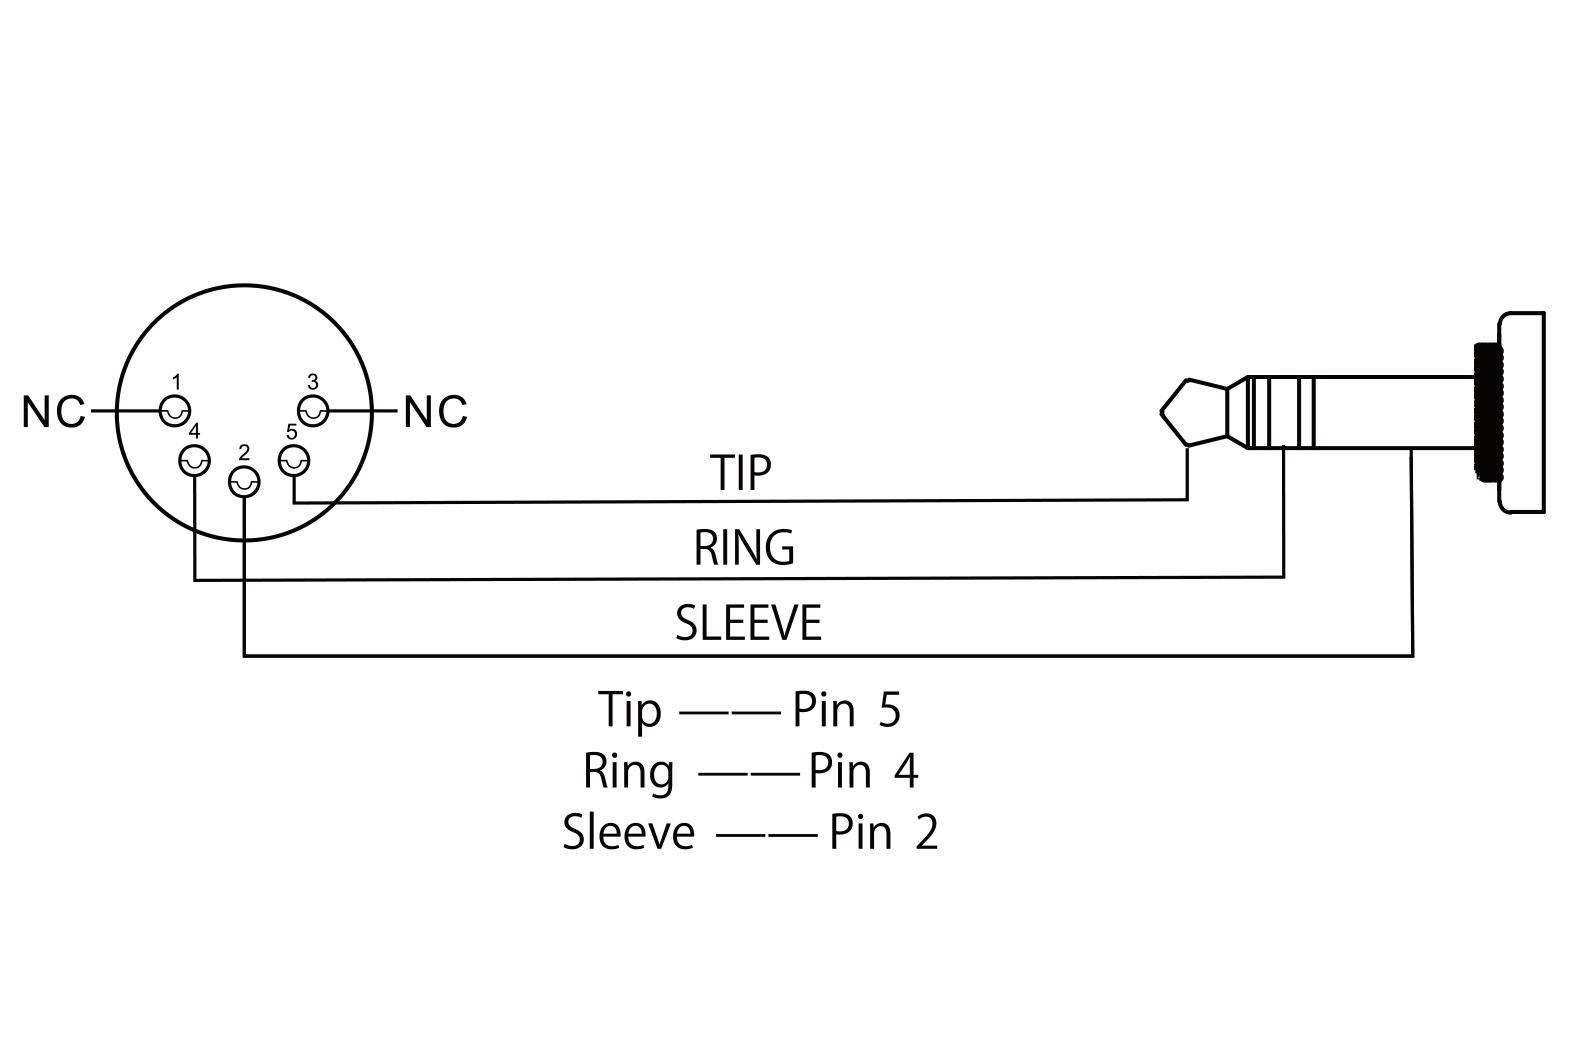 trs cable wiring diagram boss bmidi 5 35 trs midi cable  boss bmidi 5 35 trs midi cable